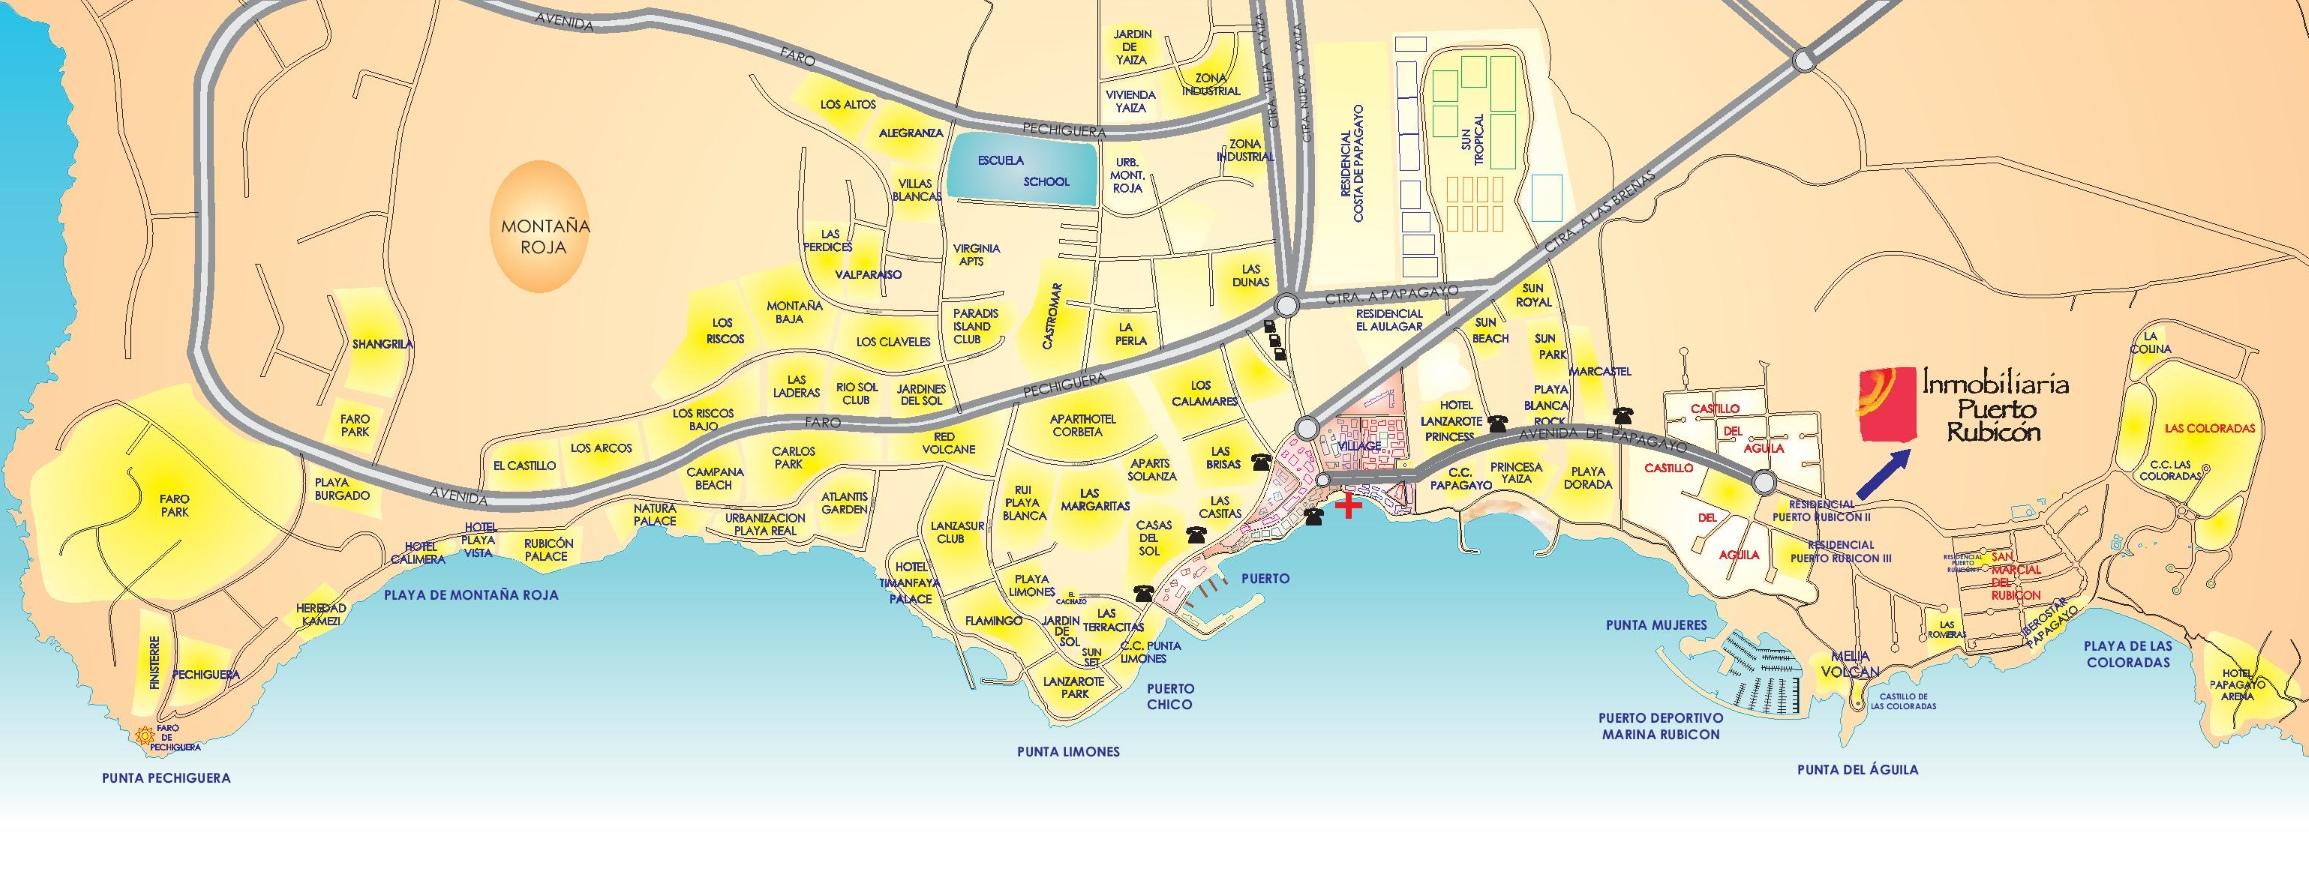 Playa Blanca Hotel Map